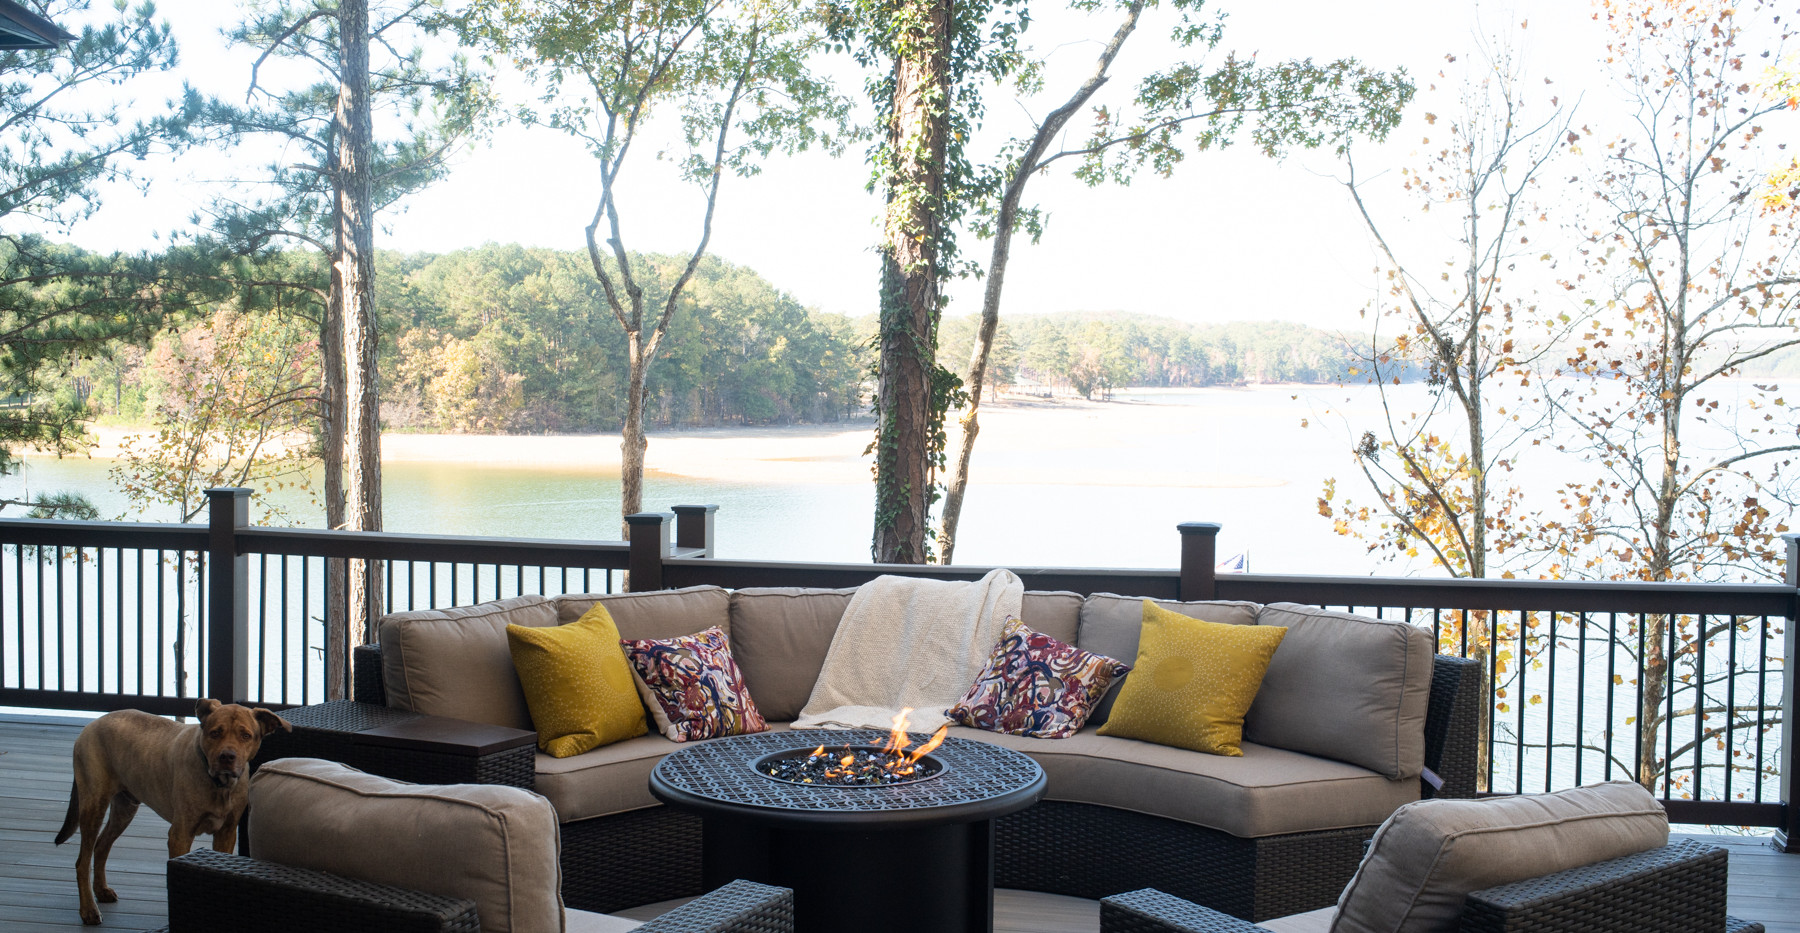 Lake house lower deck